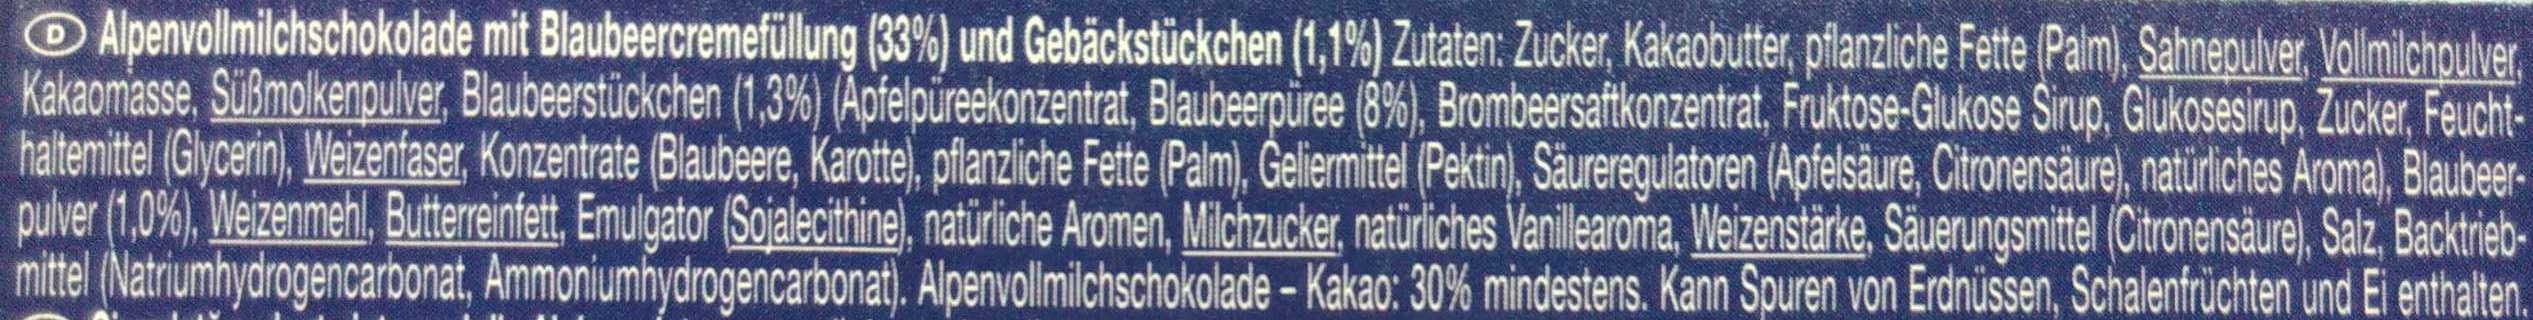 Blueberry Muffin - Ingredients - de